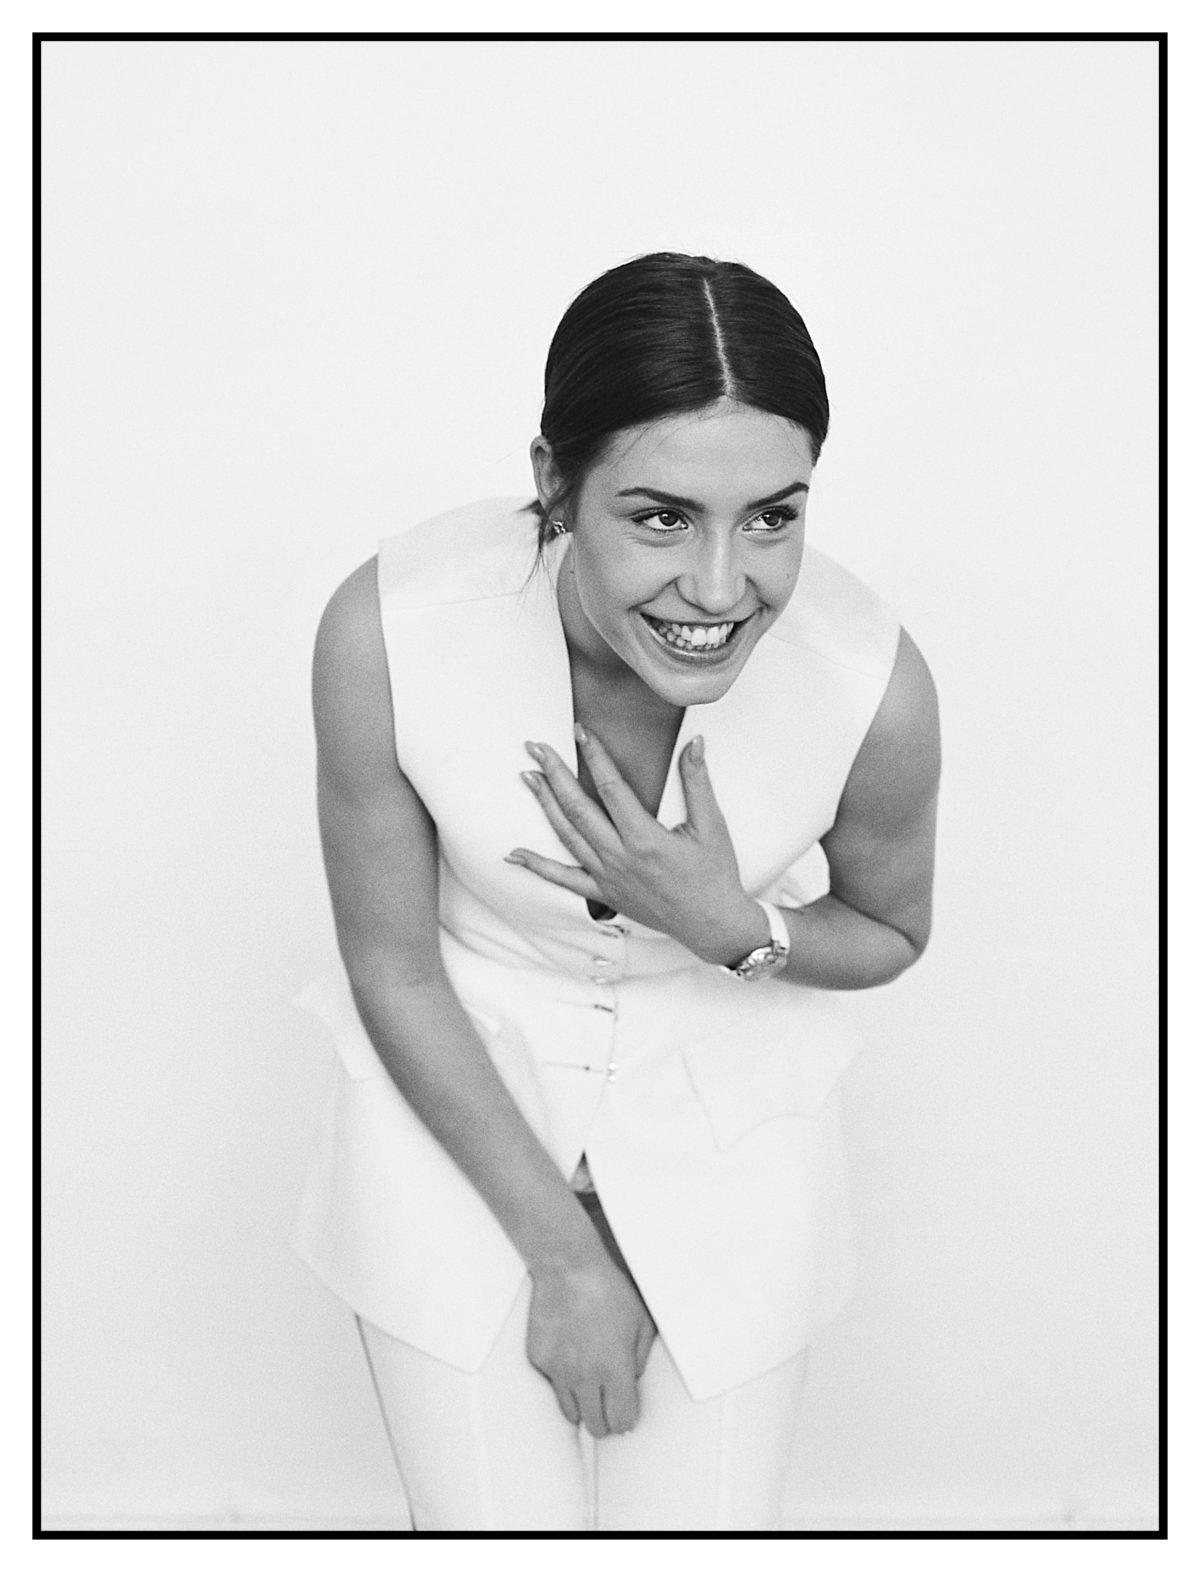 Adele Exarchopoulos (c) Stéphanie Volpato - style Arthur Mayadoux - Harper's Bazar Brazil